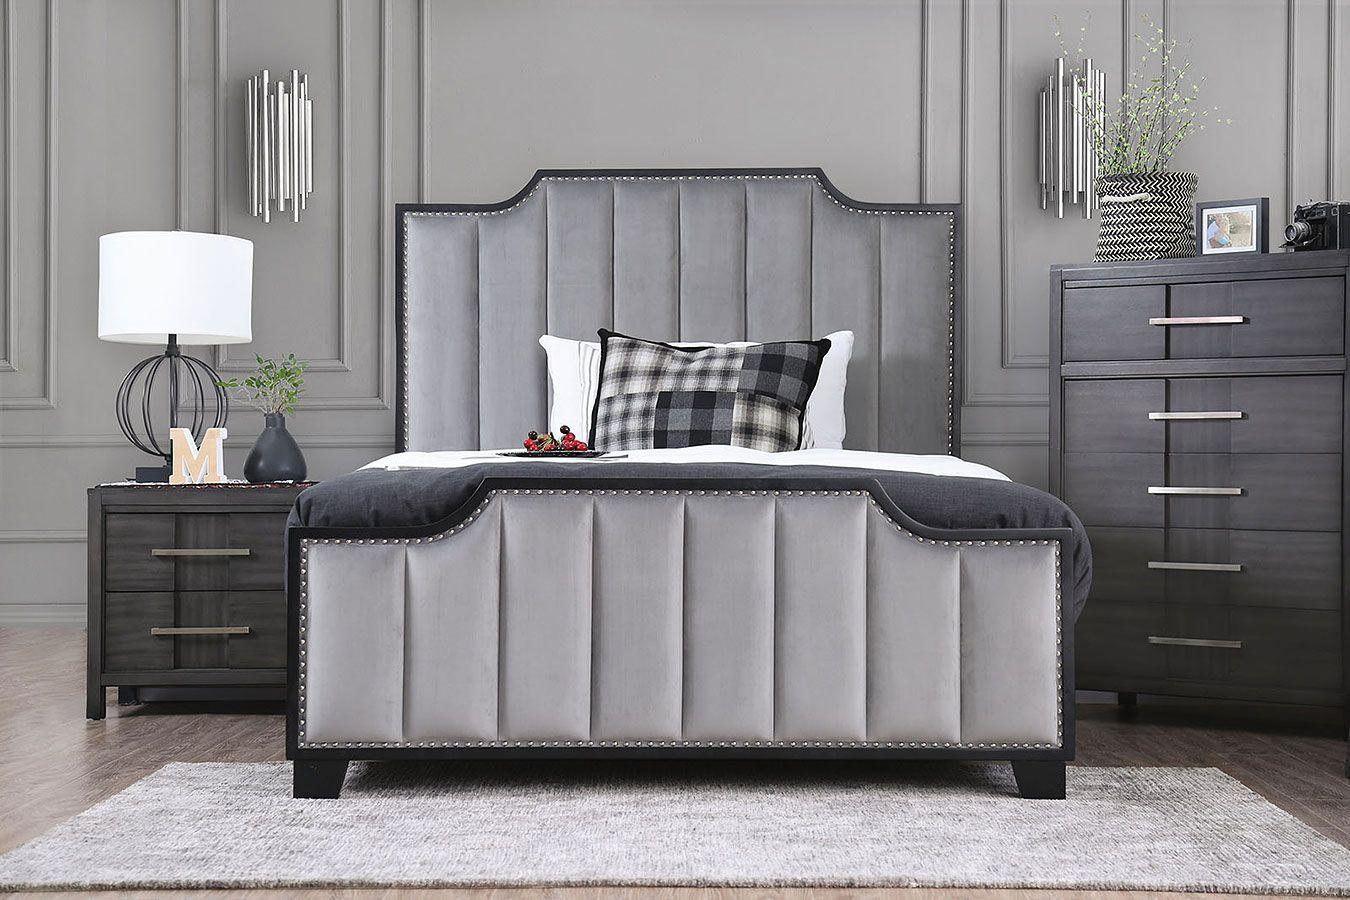 Espin Gray Upholstered Bedroom Set Upholstered Bedroom Upholstered Bedroom Set Grey Upholstered Bed